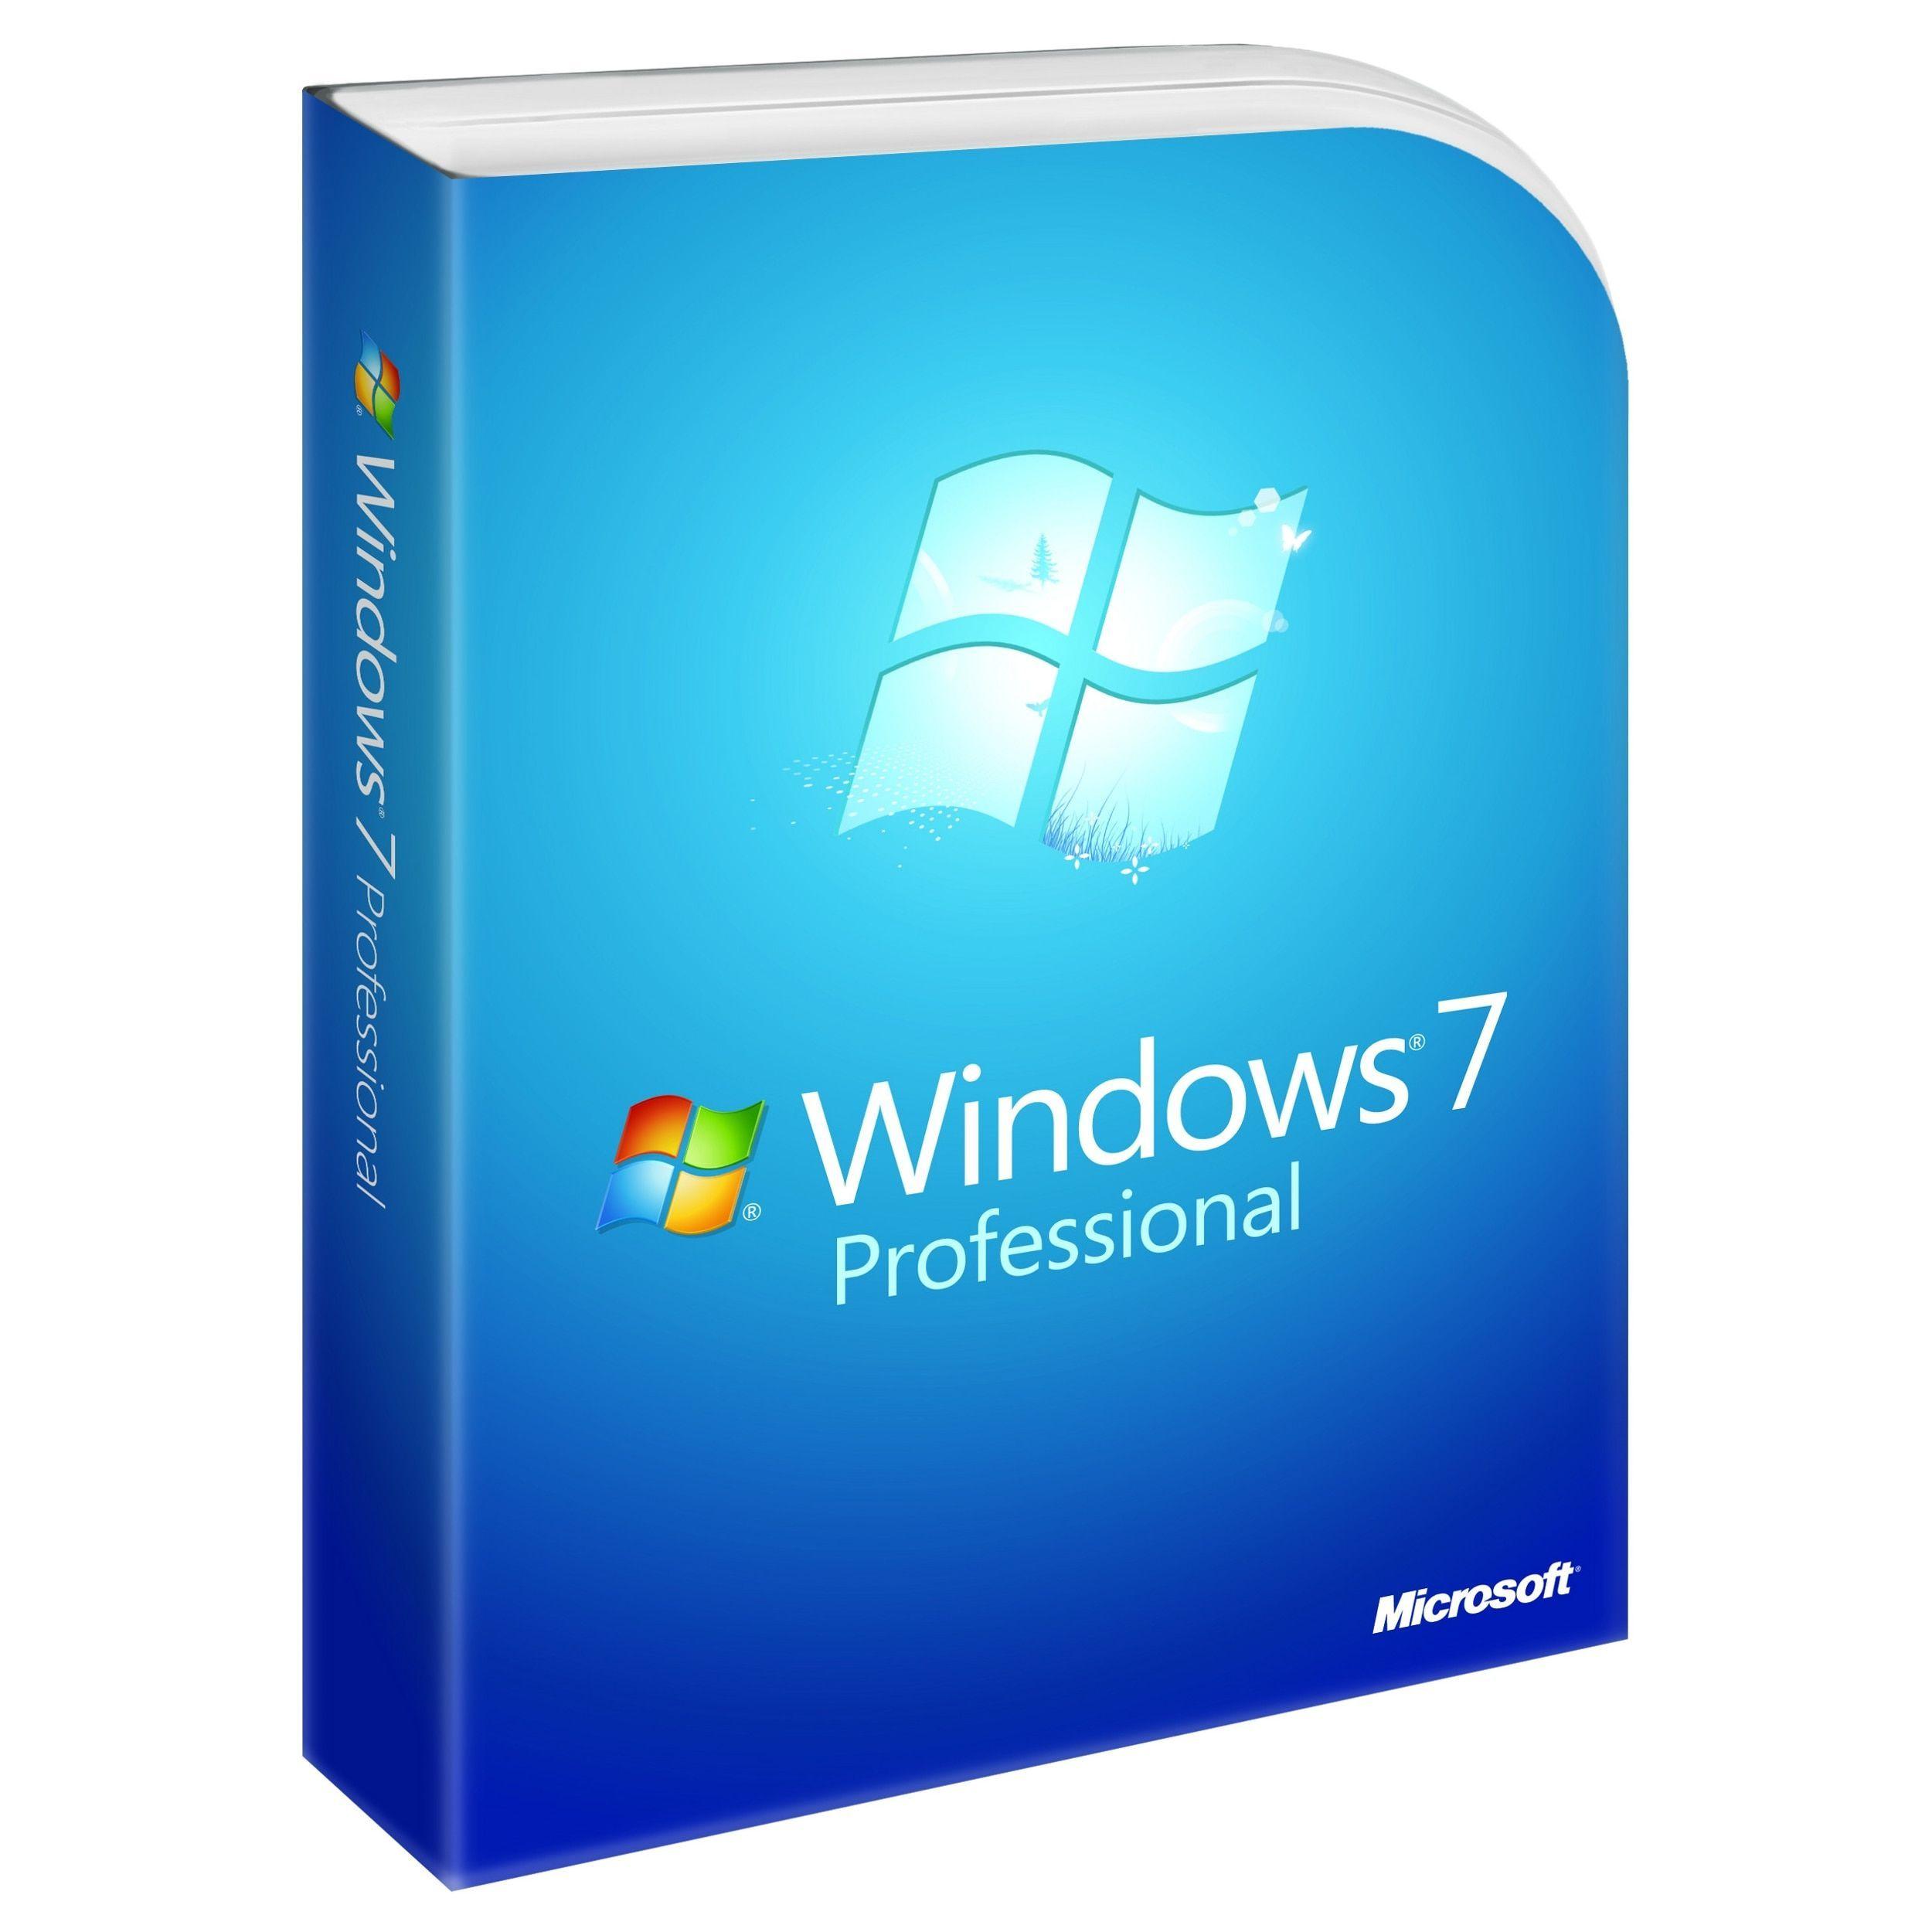 windows 7 service pack 1 product key 64 bit